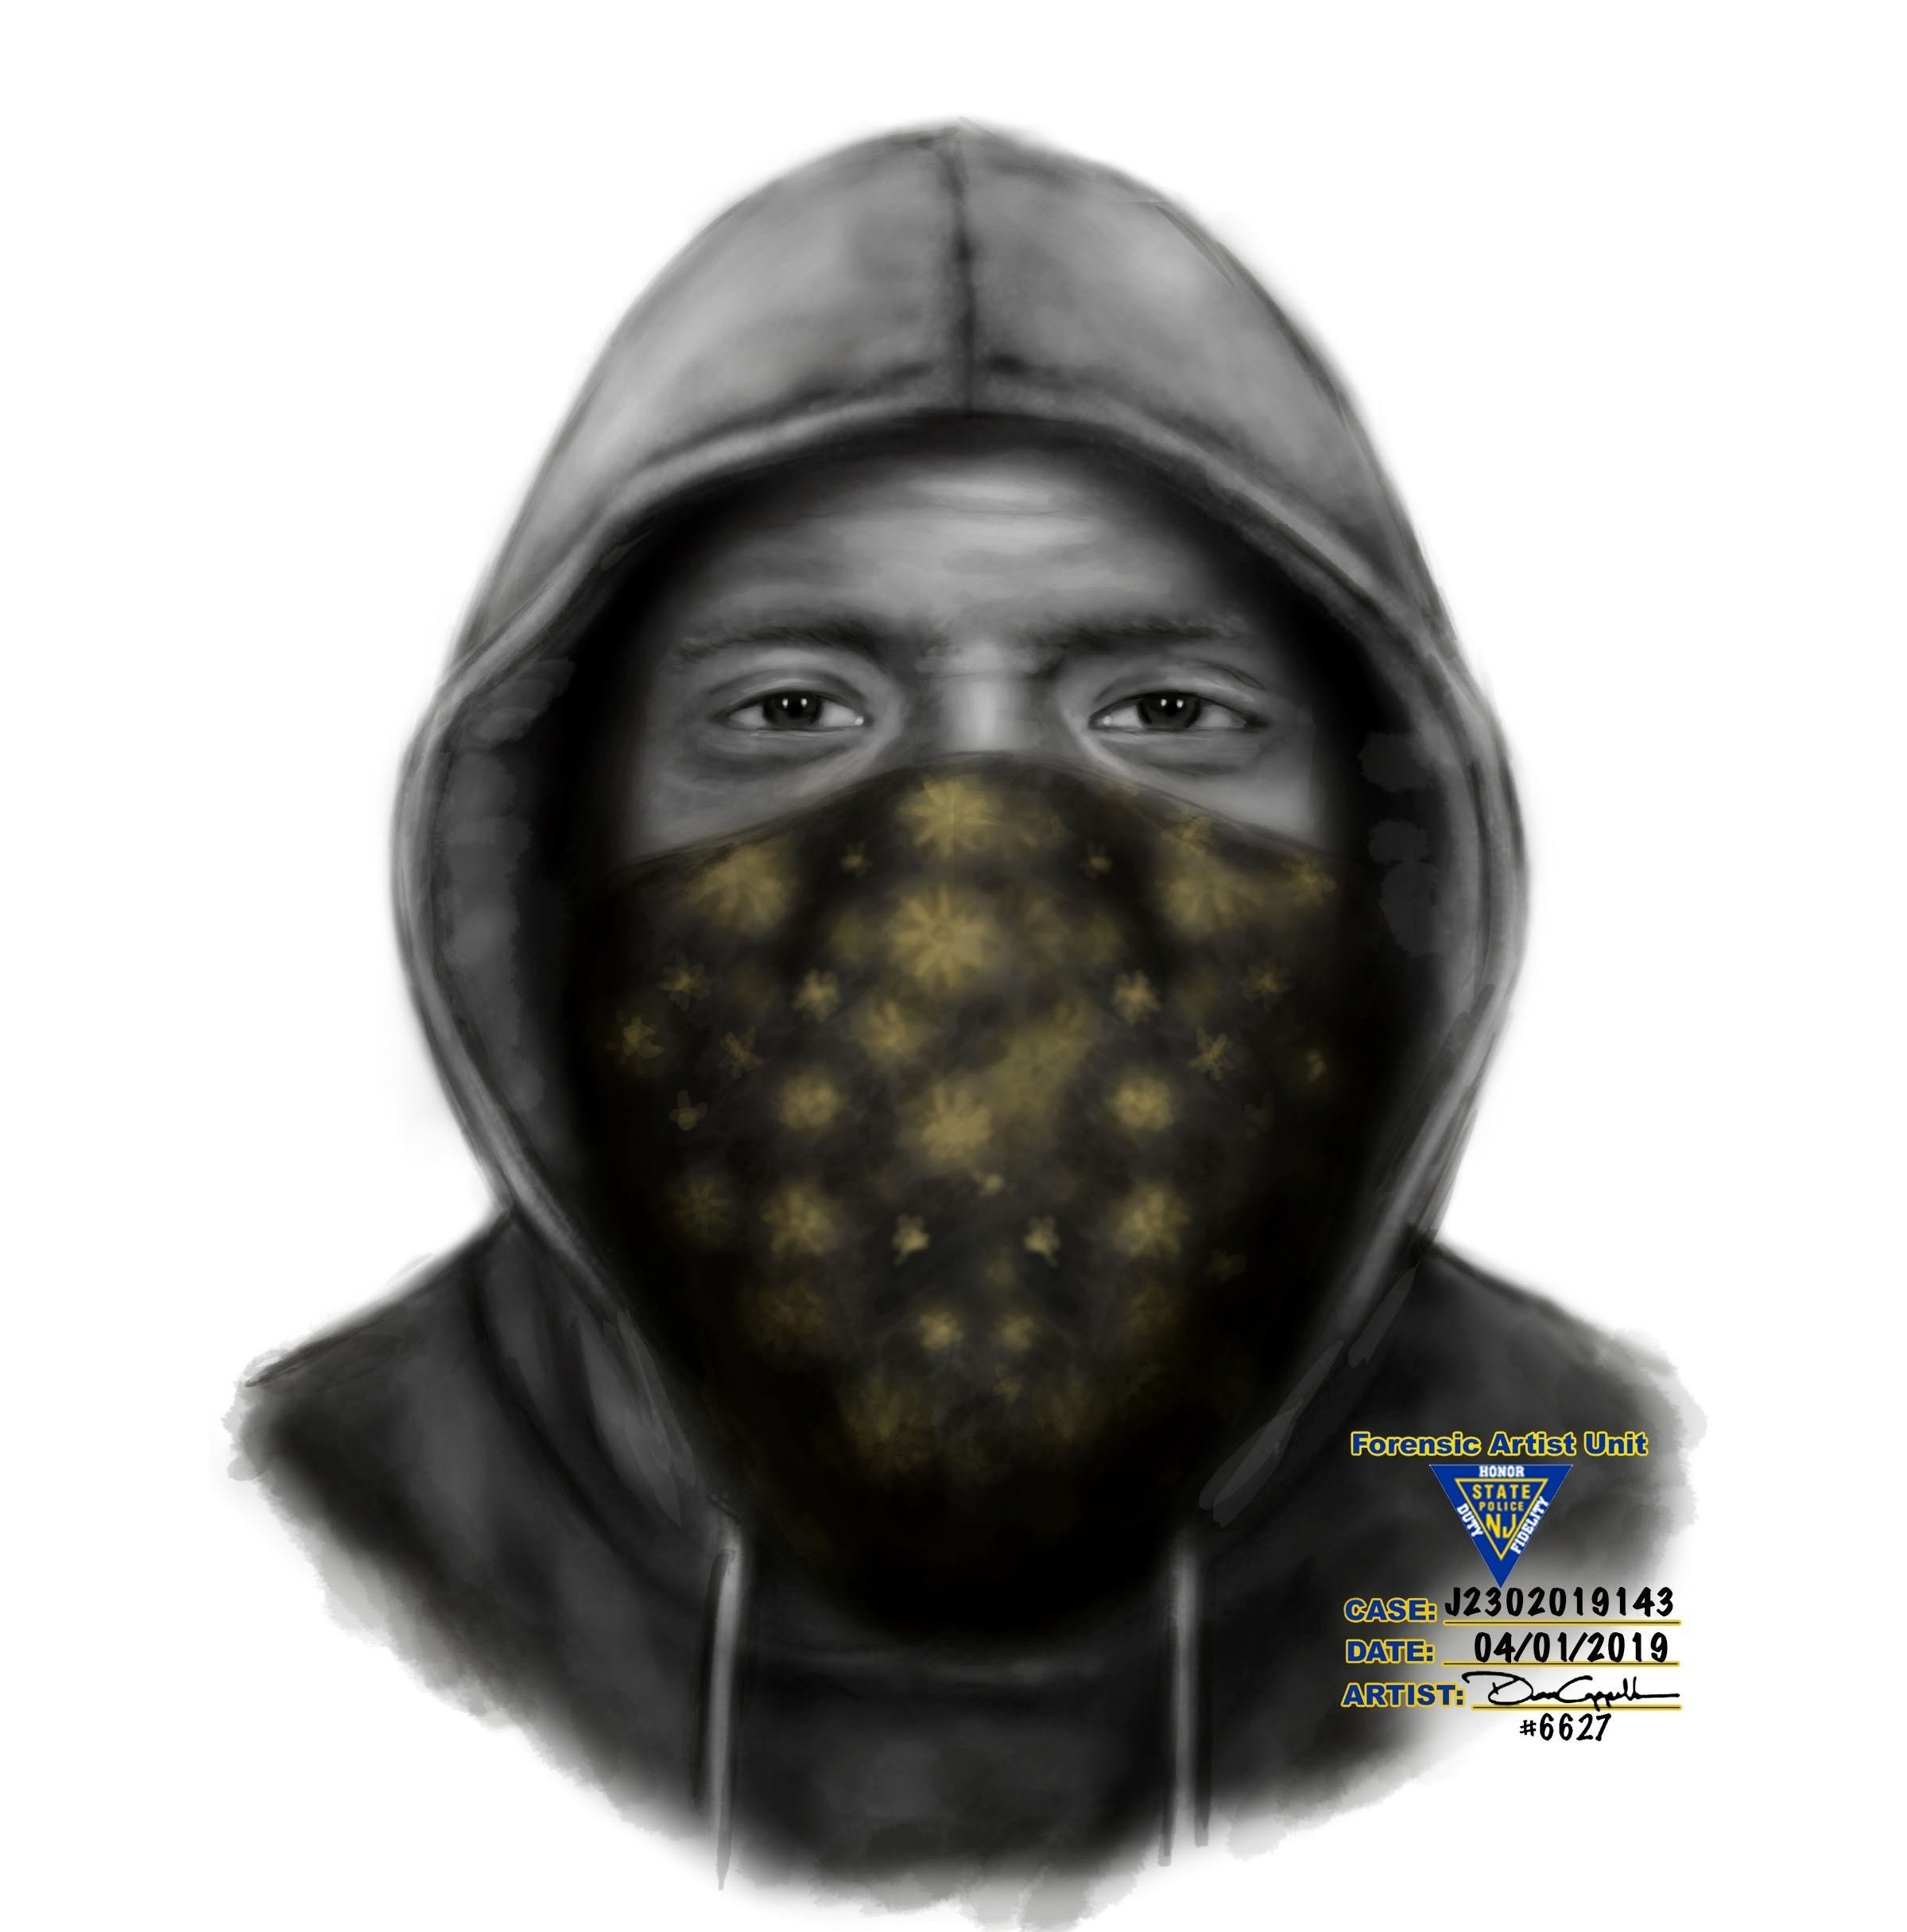 Marlboro ATM robbery: Help cops ID suspect